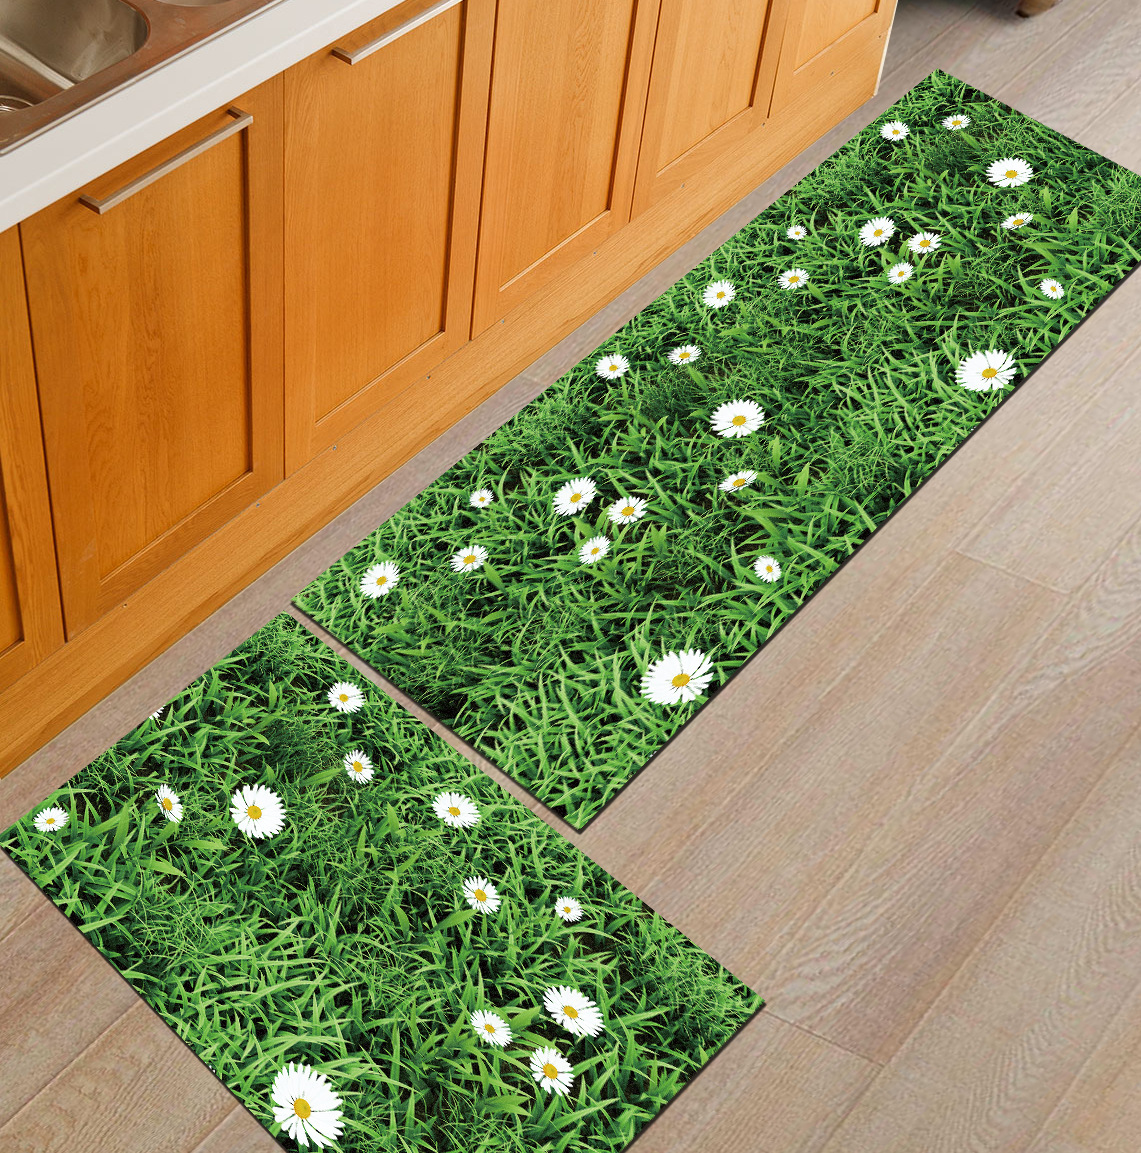 Zeegle Golden Leaves Printed Entrance Door Mats Flannel Kitchen Area Rug Anti-slip Bathroom Mats Bedroom Carpets Bedside Mats